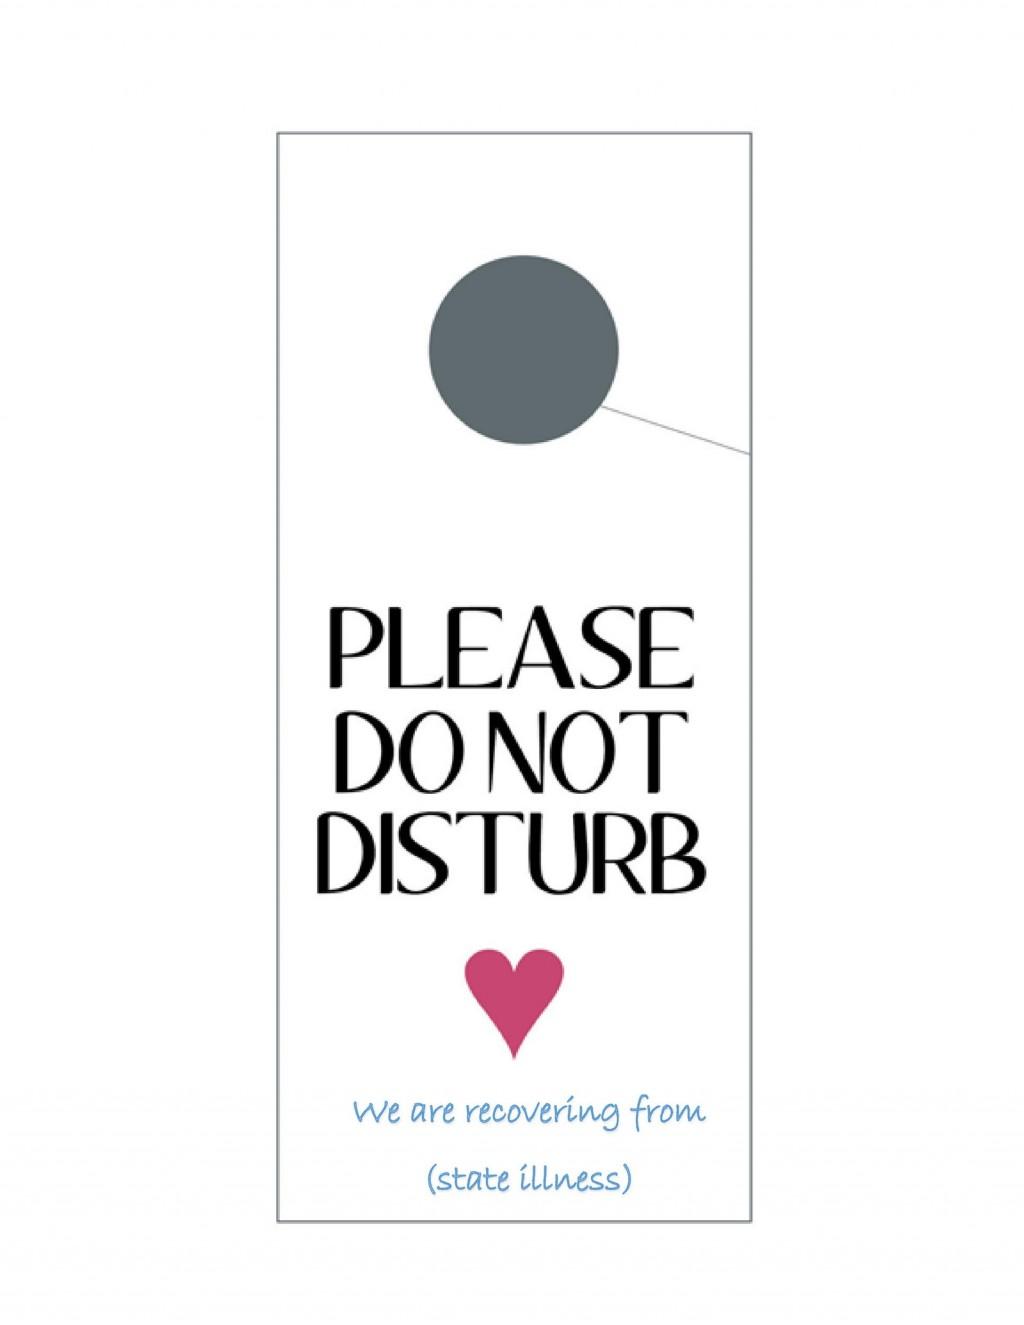 005 Wonderful Door Hanger Template For Word Inspiration  Free MicrosoftLarge